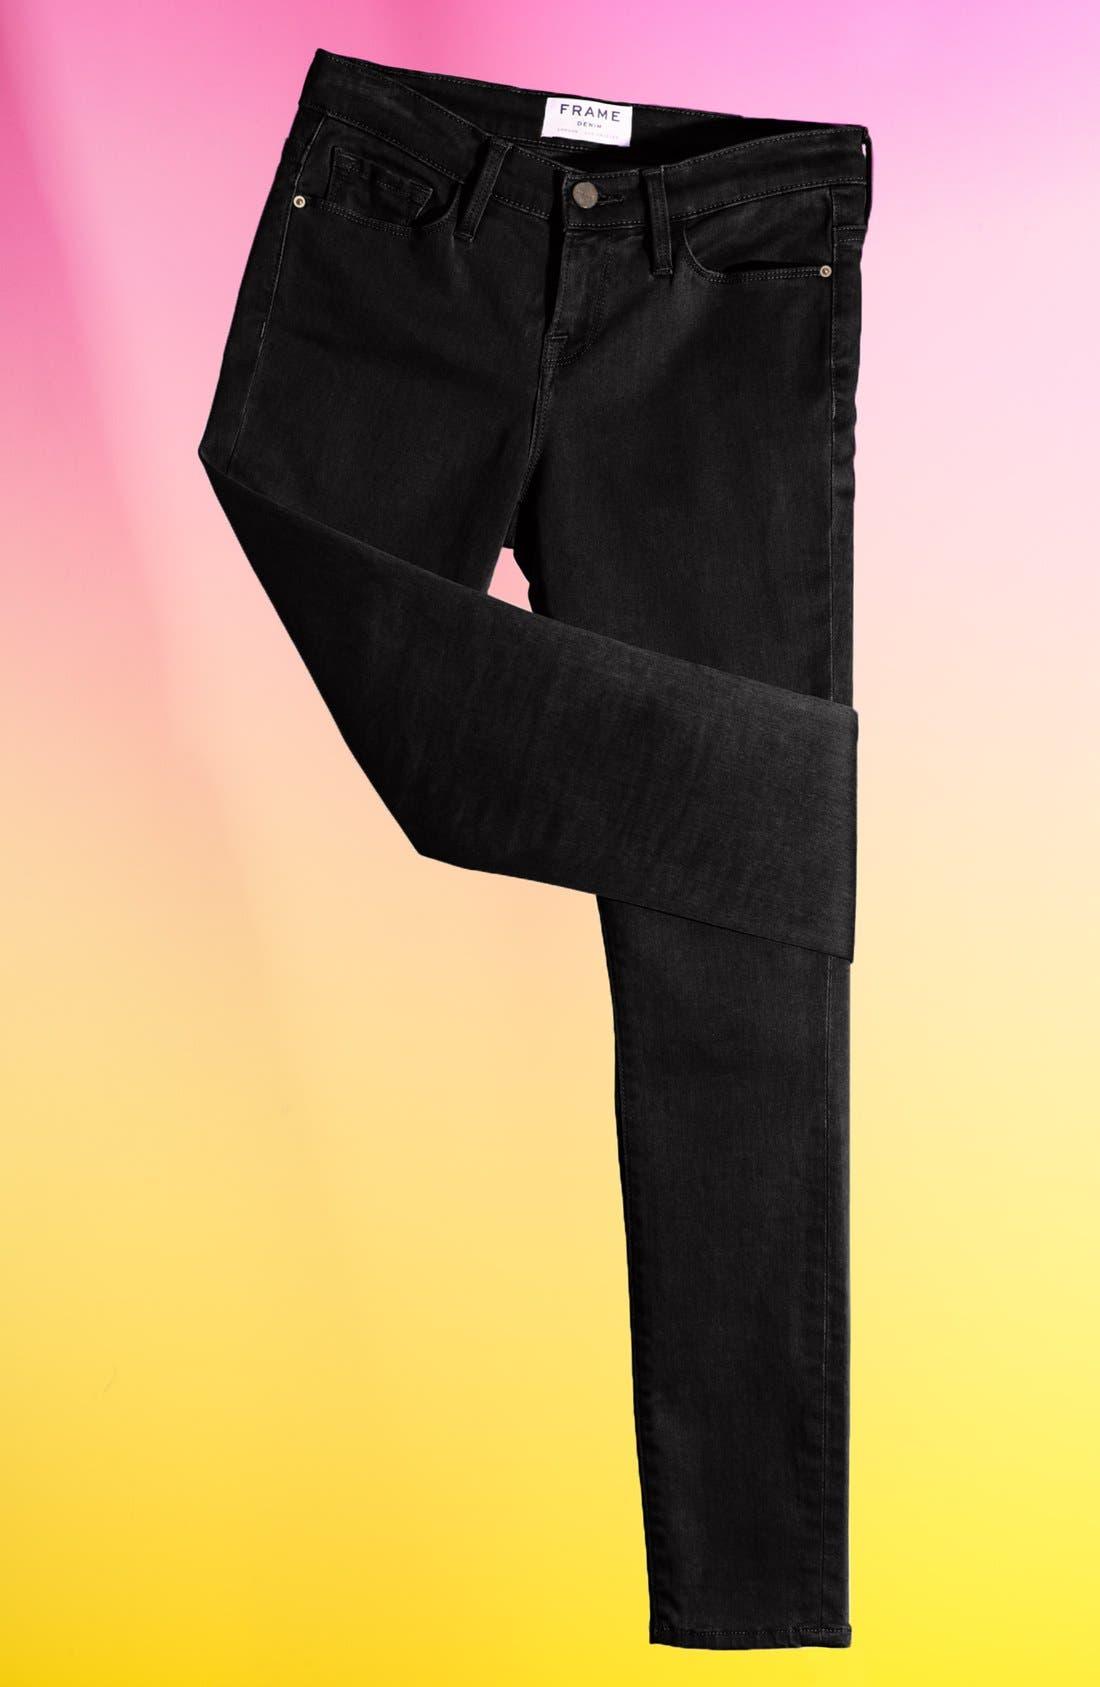 Alternate Image 1 Selected - Frame Denim 'Le Luxe Noir' Skinny Jeans (Vian)